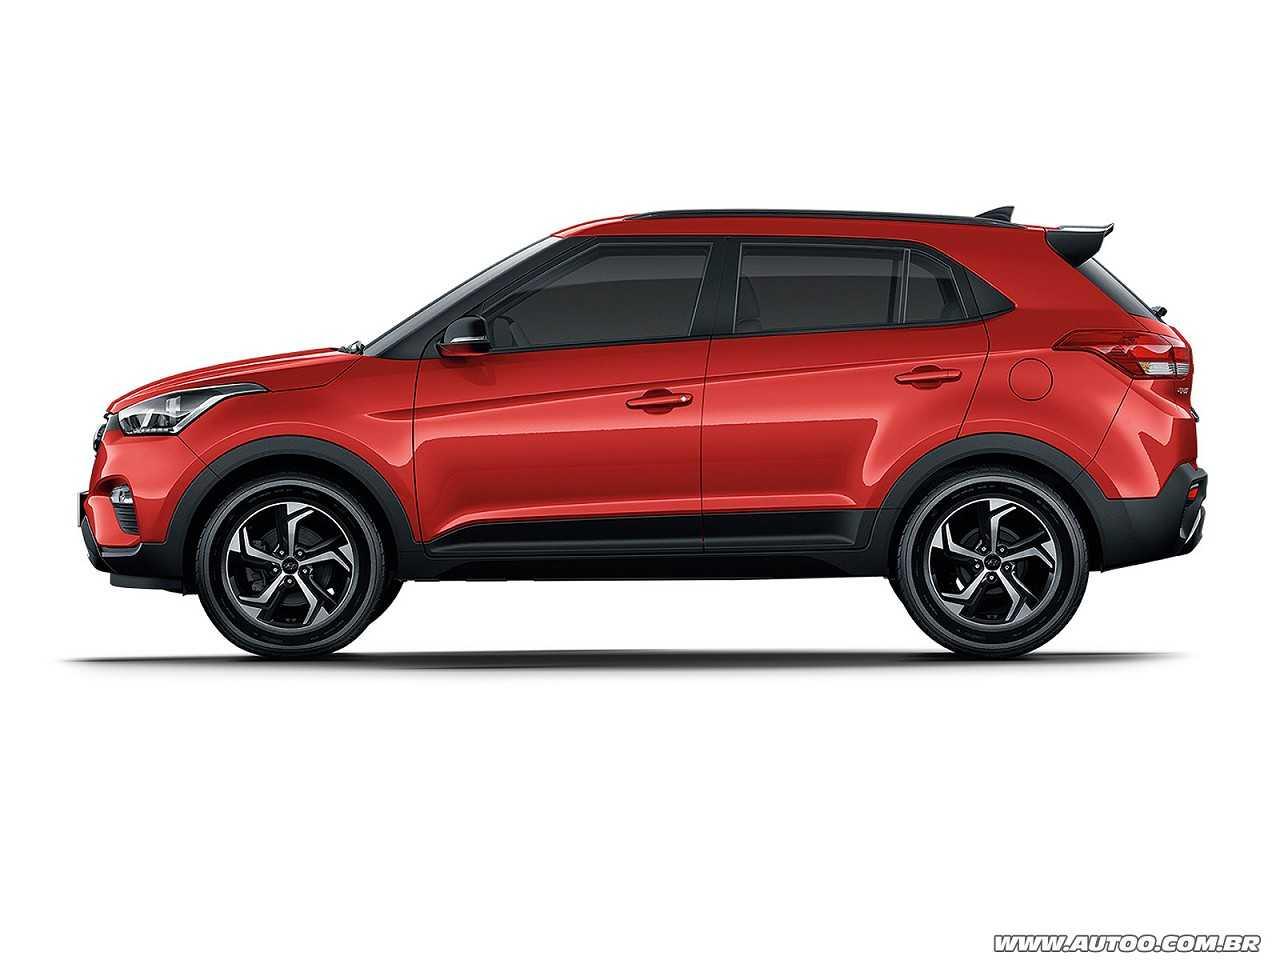 HyundaiCreta 2019 - lateral